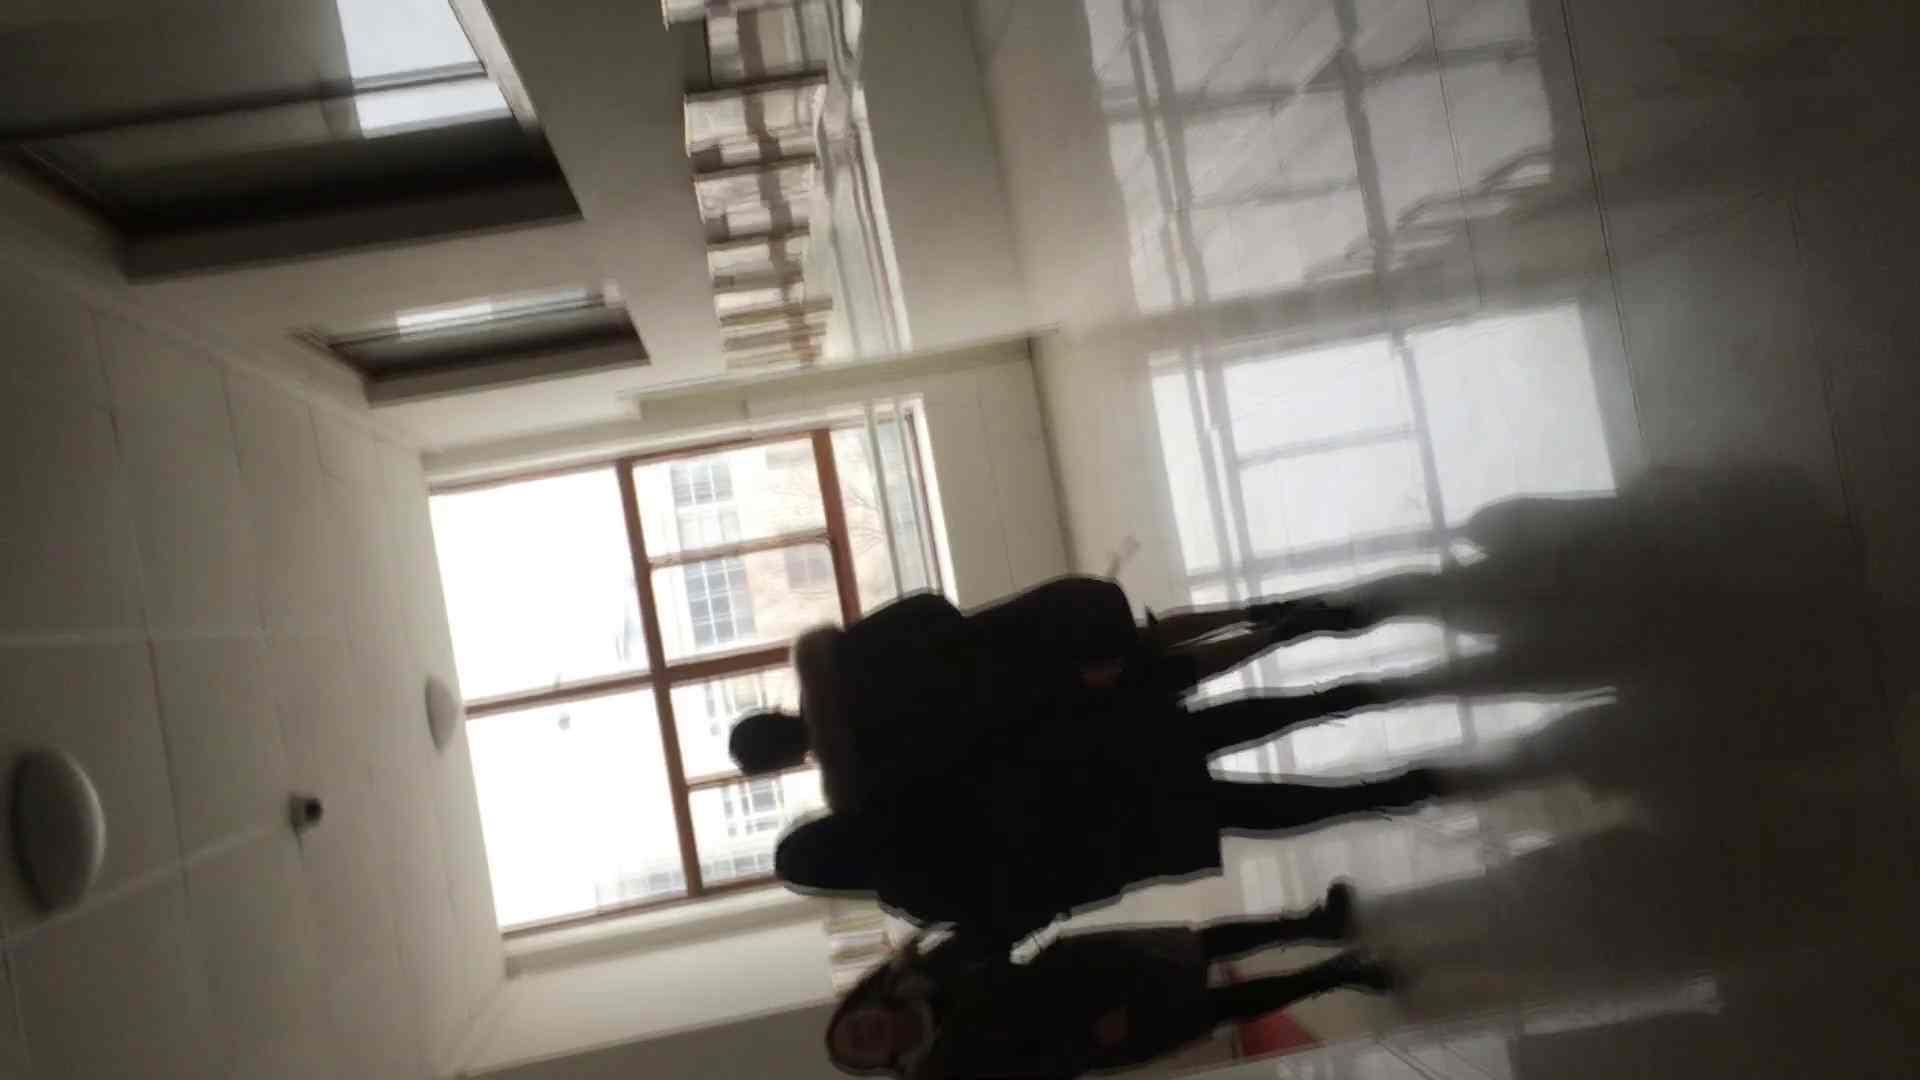 芸術大学ガチ潜入盗撮 JD盗撮 美女の洗面所の秘密 Vol.89 洗面所着替え | 潜入エロ調査  77連発 59